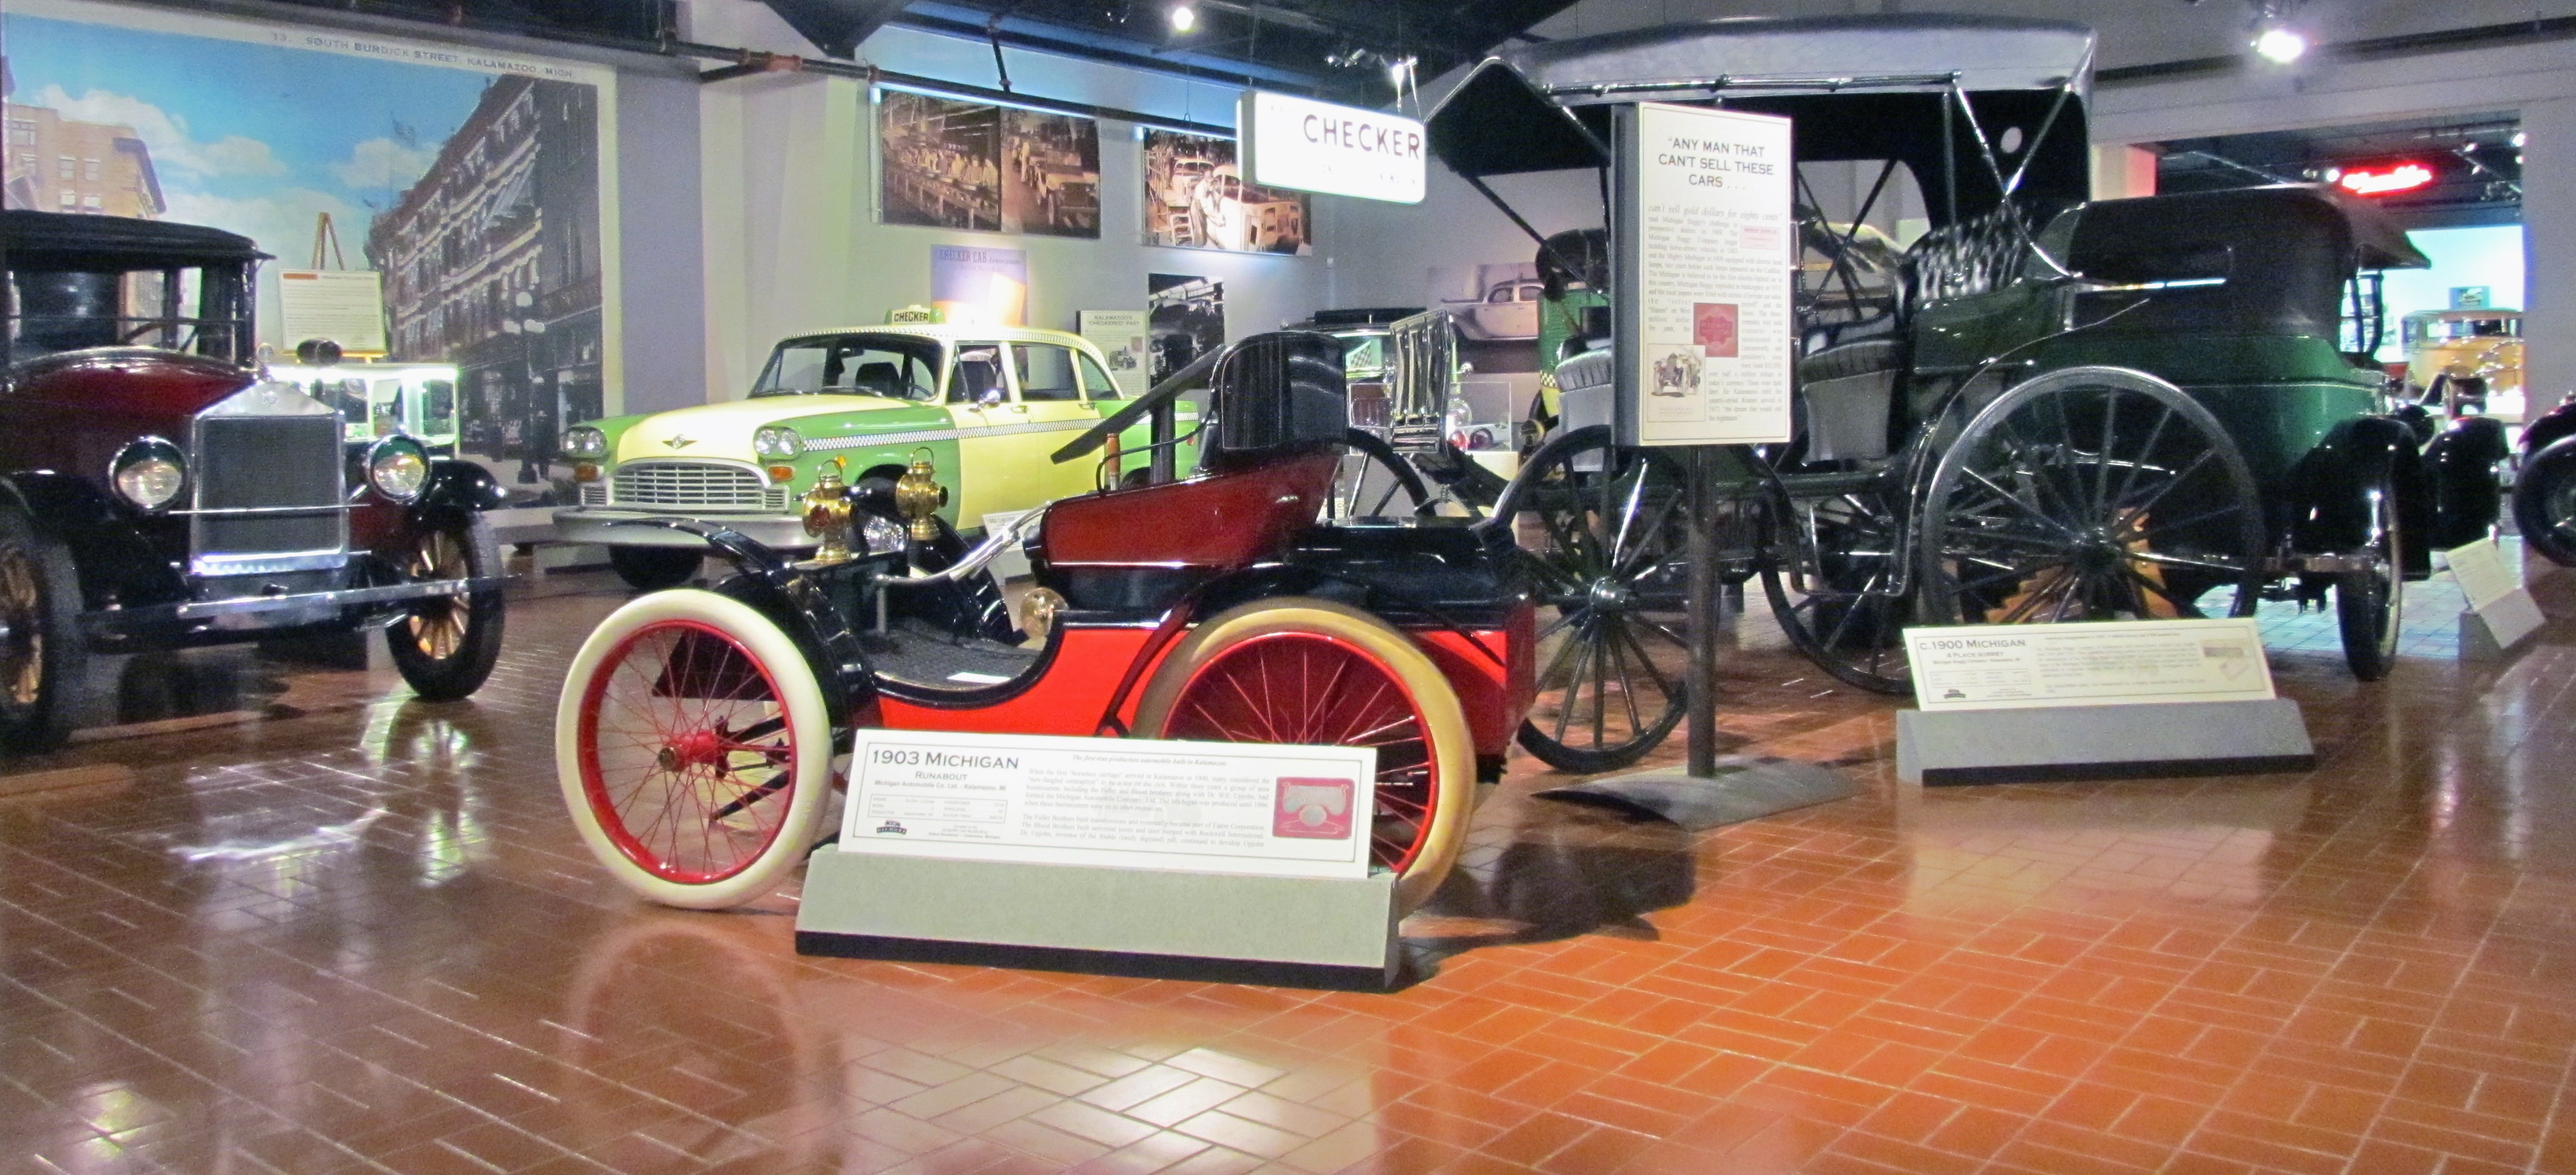 The cars of Kalamazoo - ClassicCars.com Journal